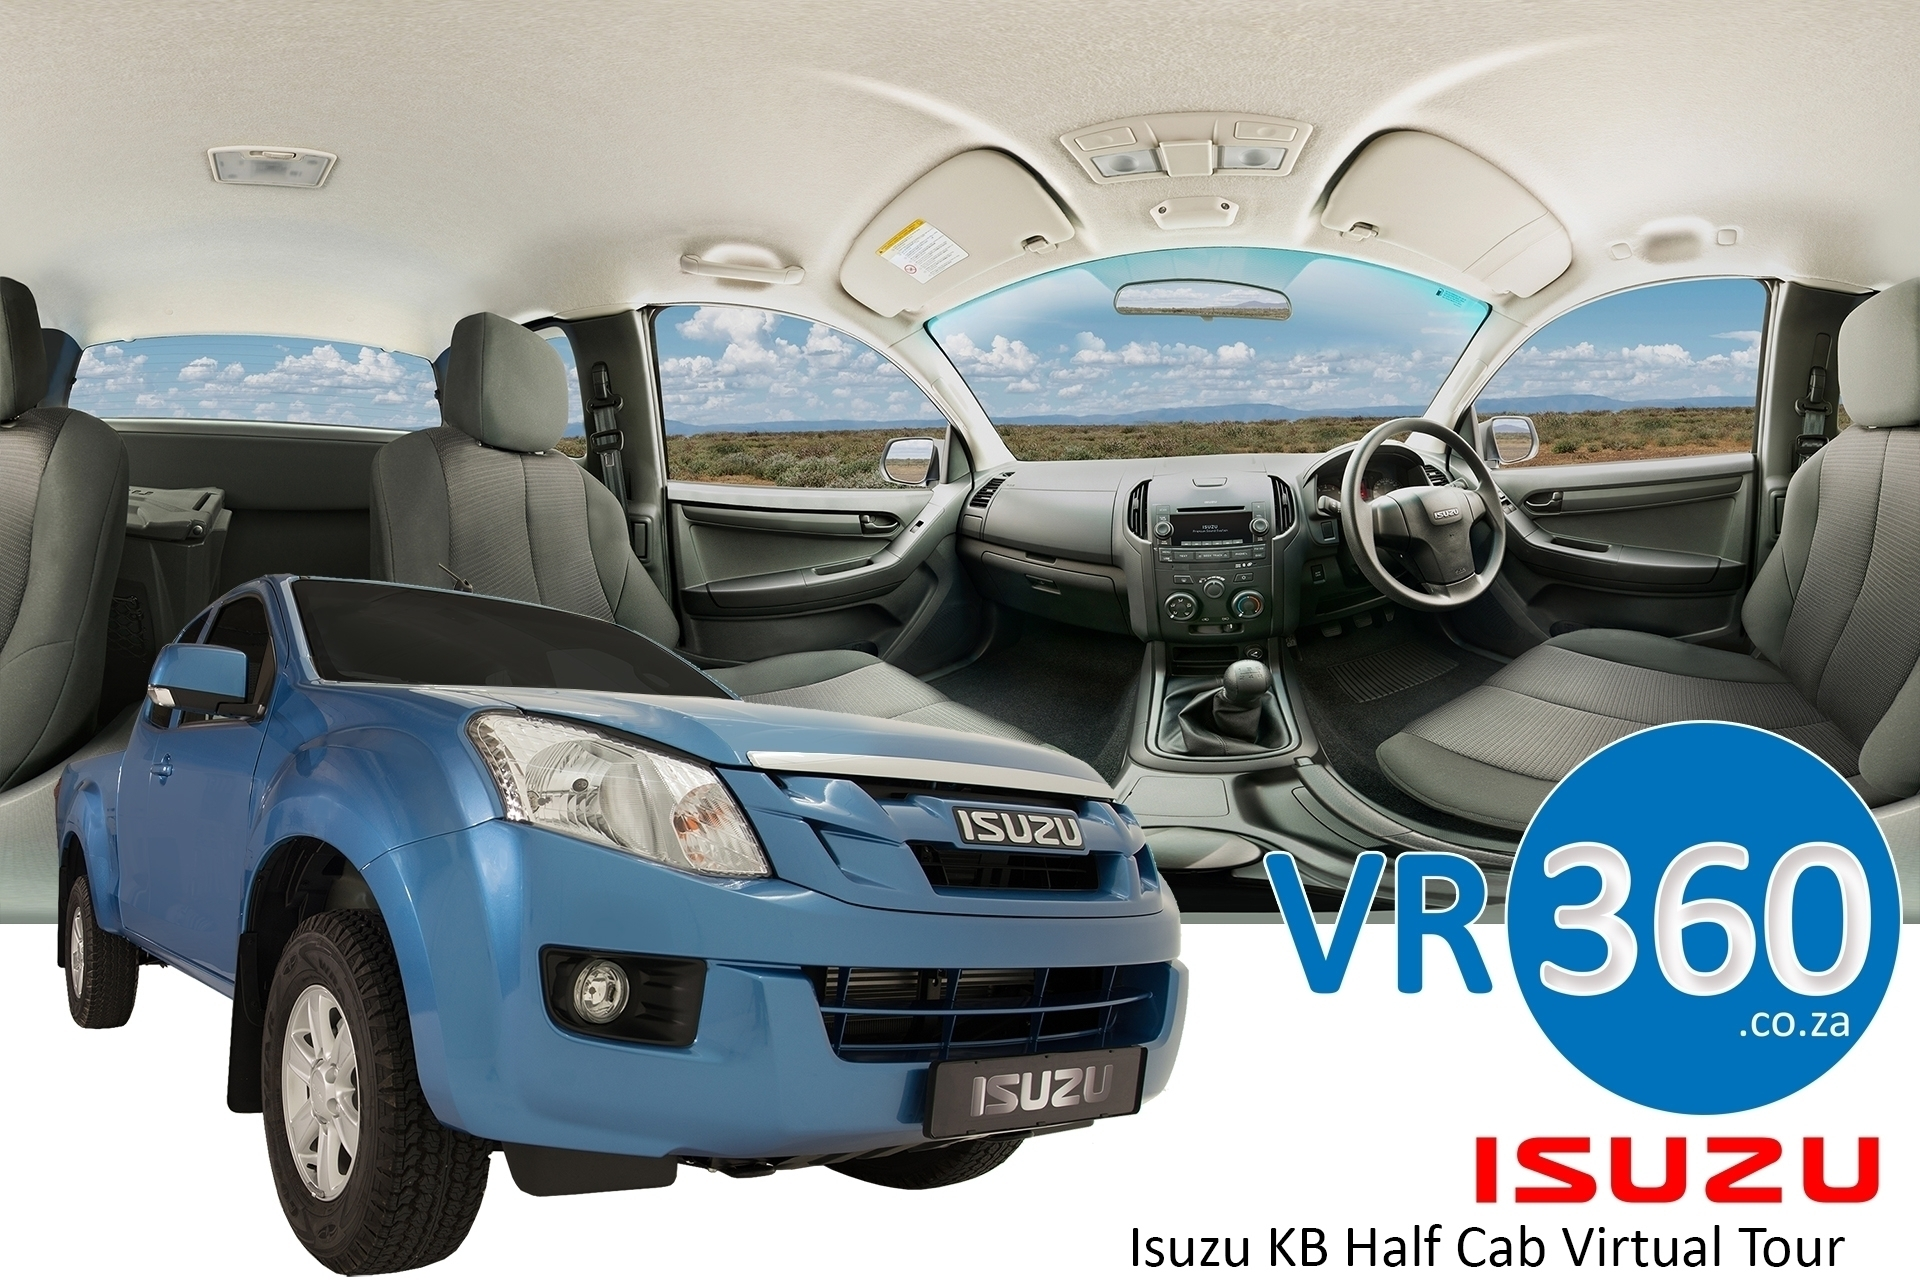 isuzu-kb-half-cab-virtual-tour